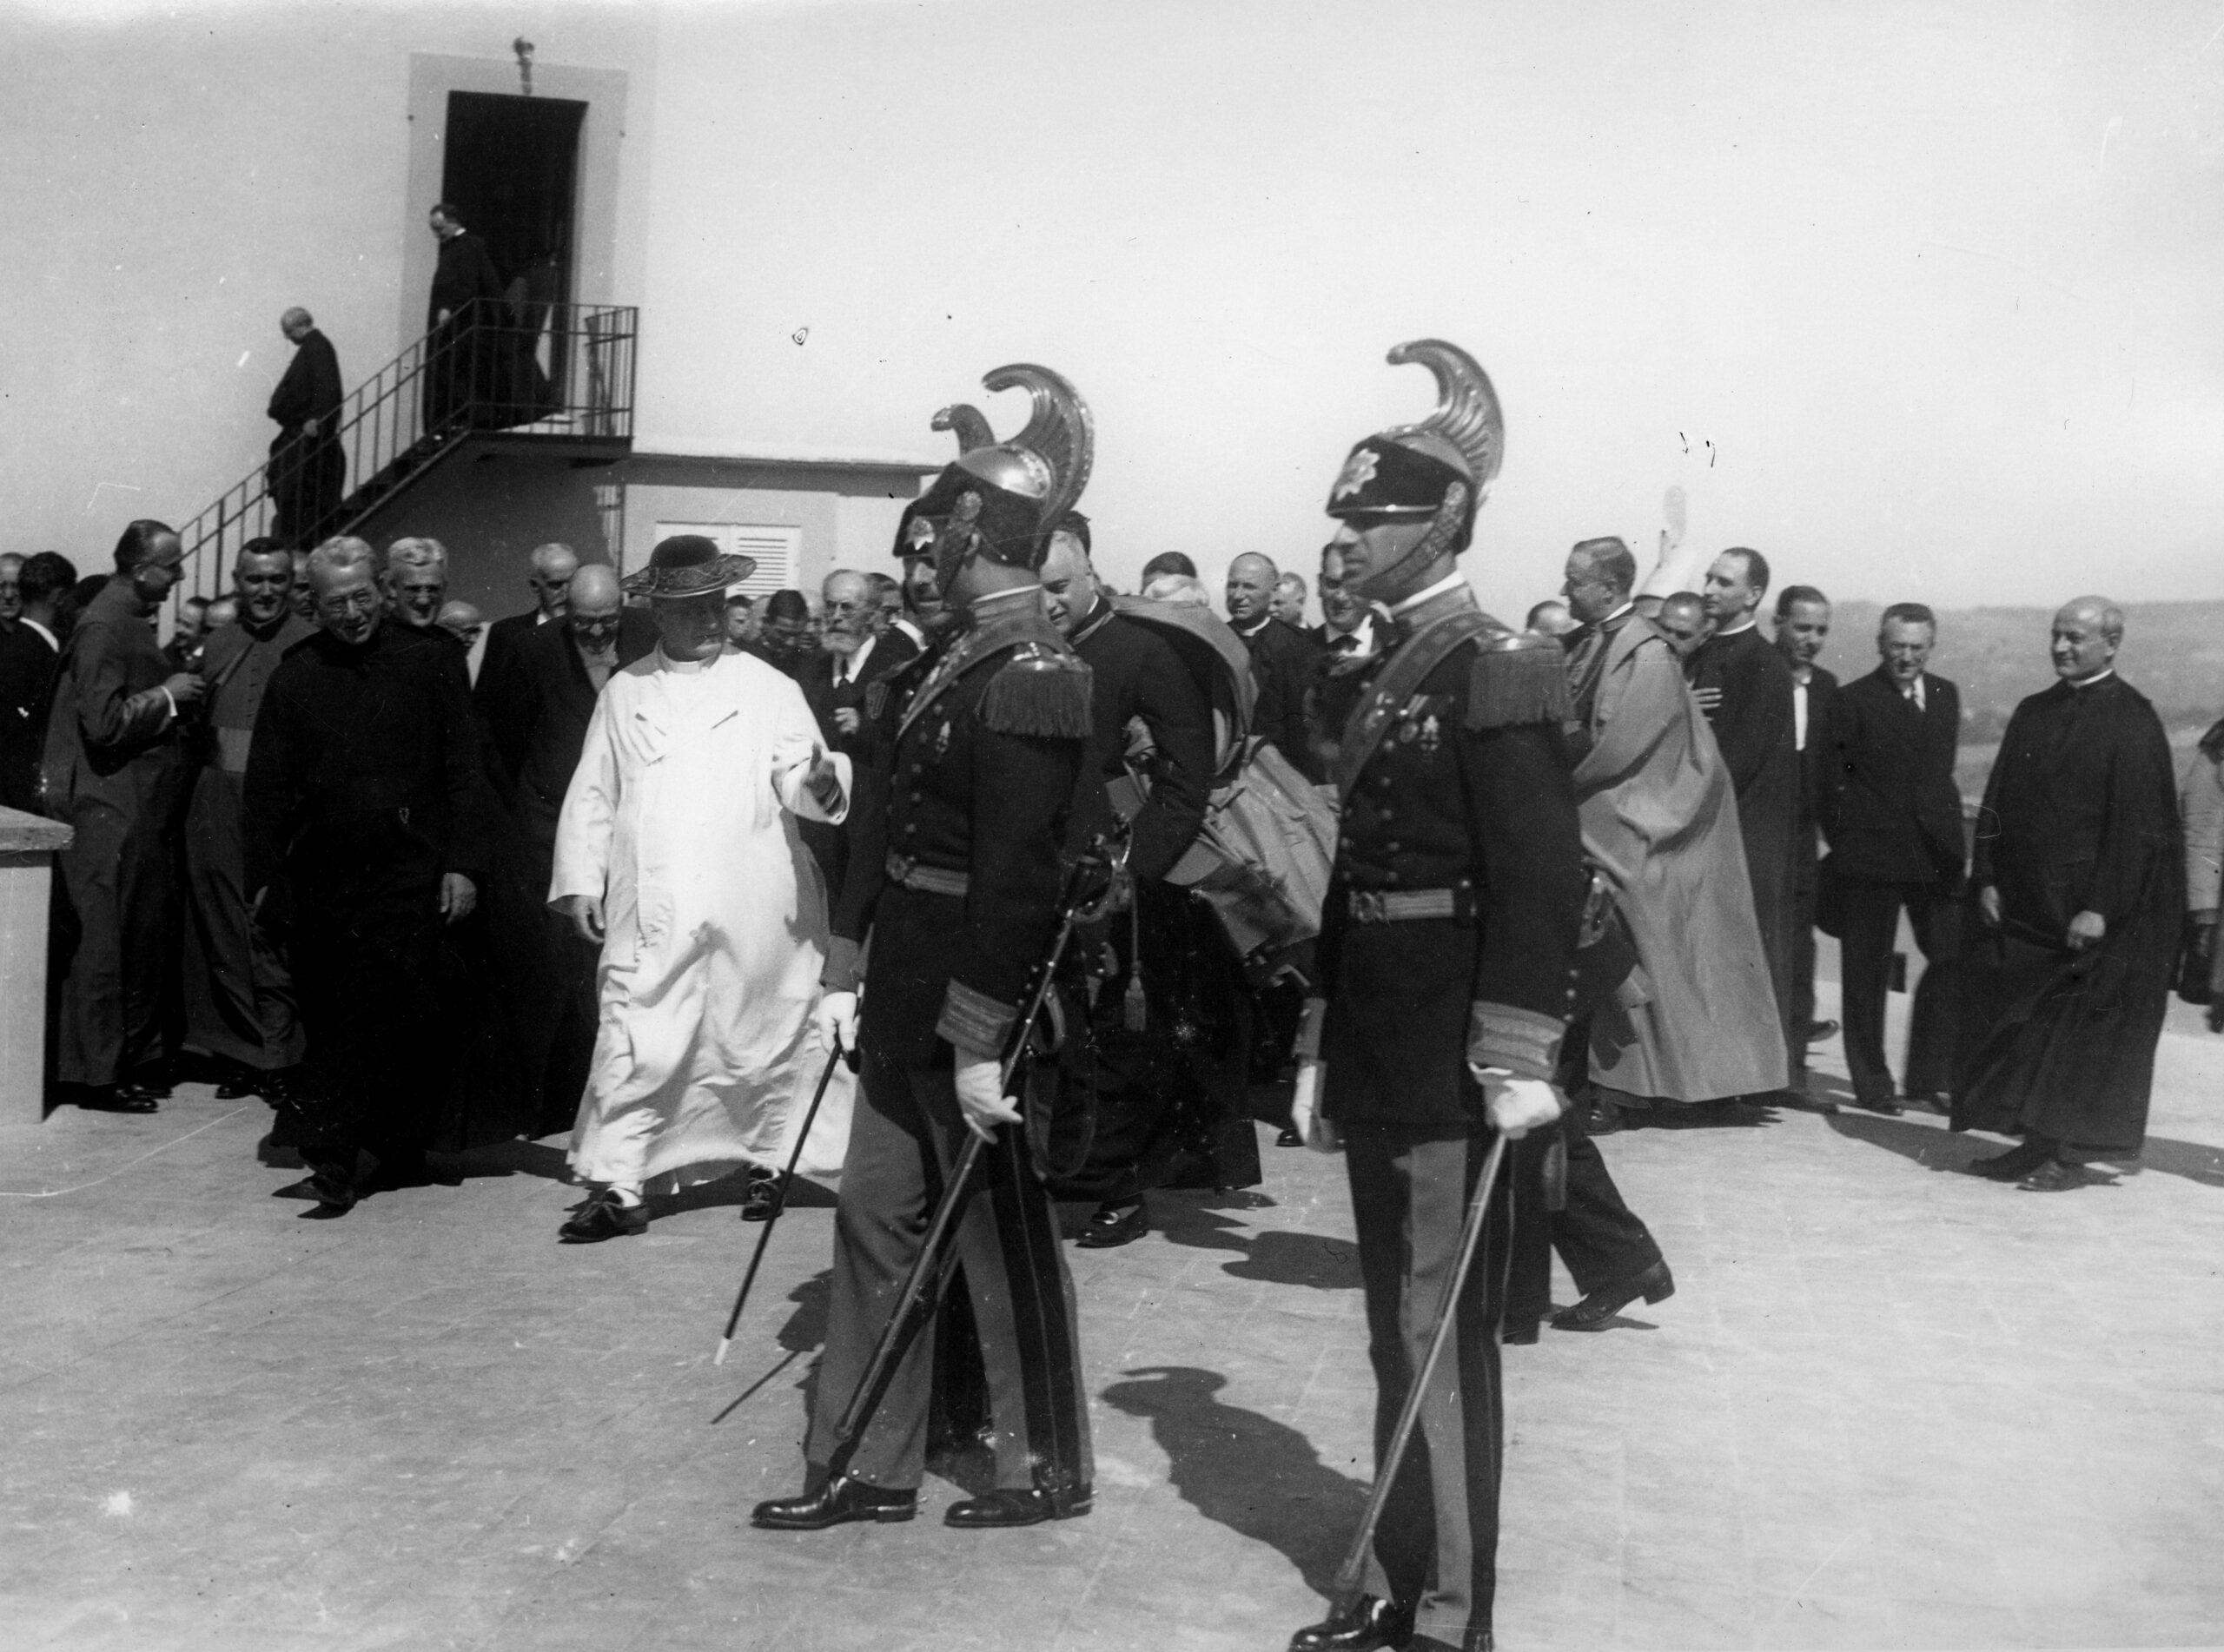 Pope Pius XI at the Dedication of the New Telescopes at Castel Gandolfo